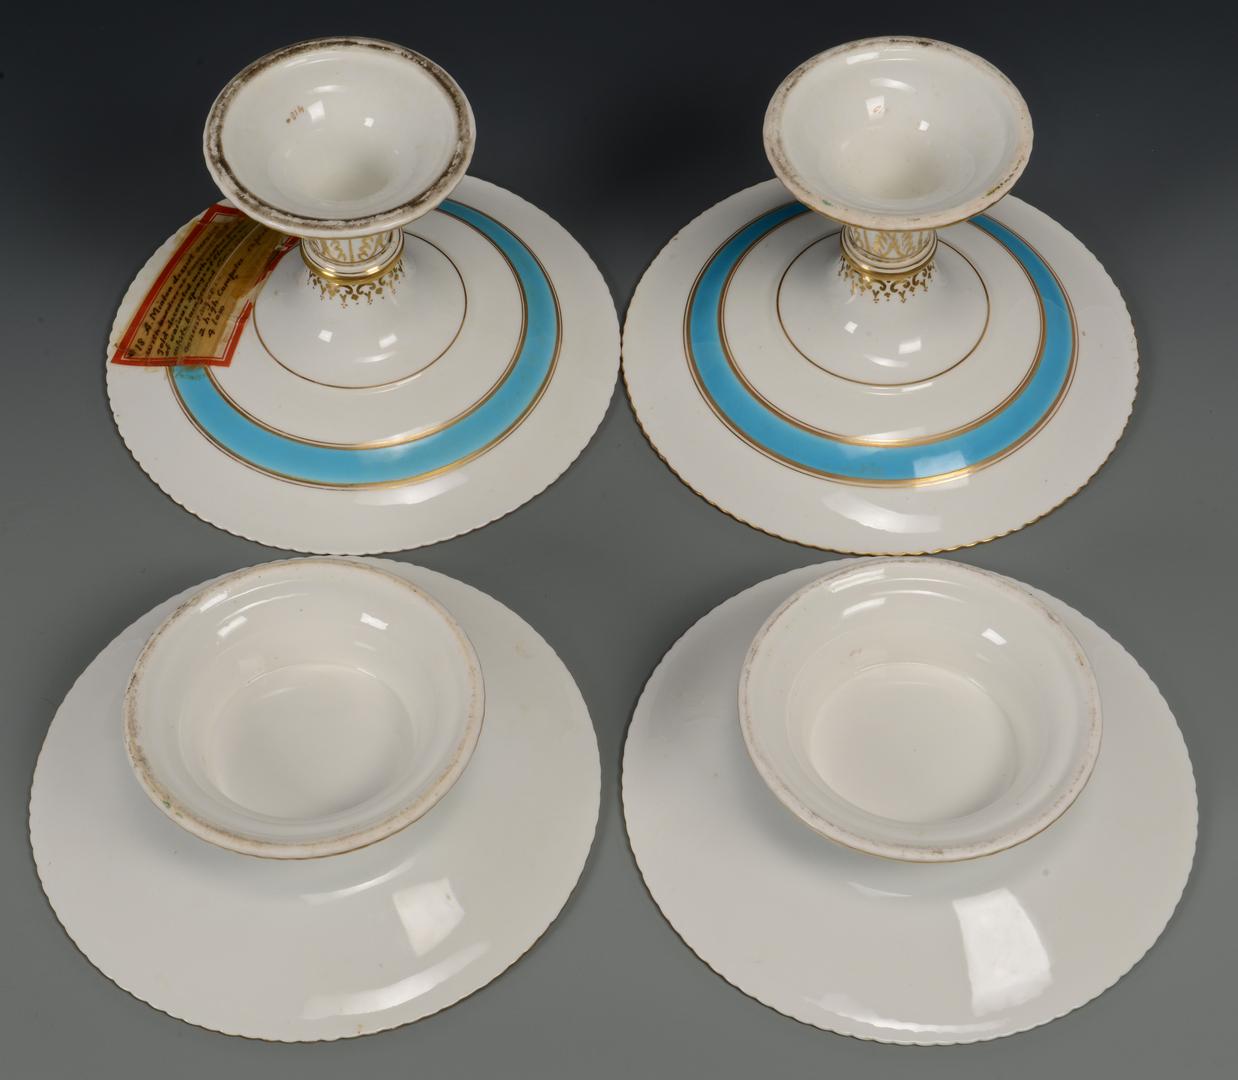 Lot 625: Minton Dessert Set